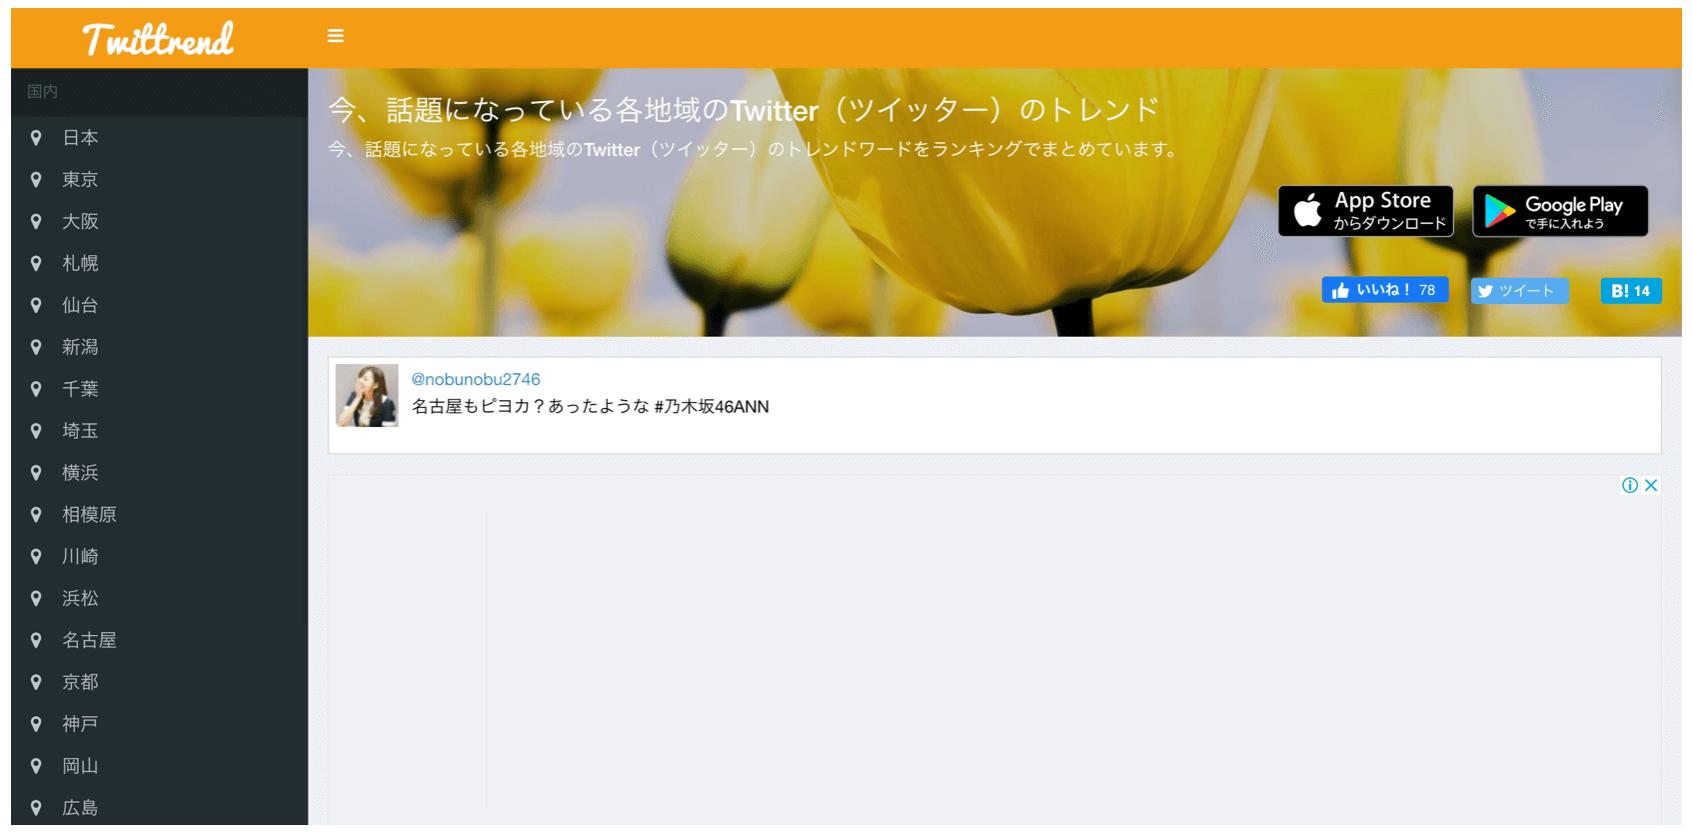 Twittrend 公式ホームページ